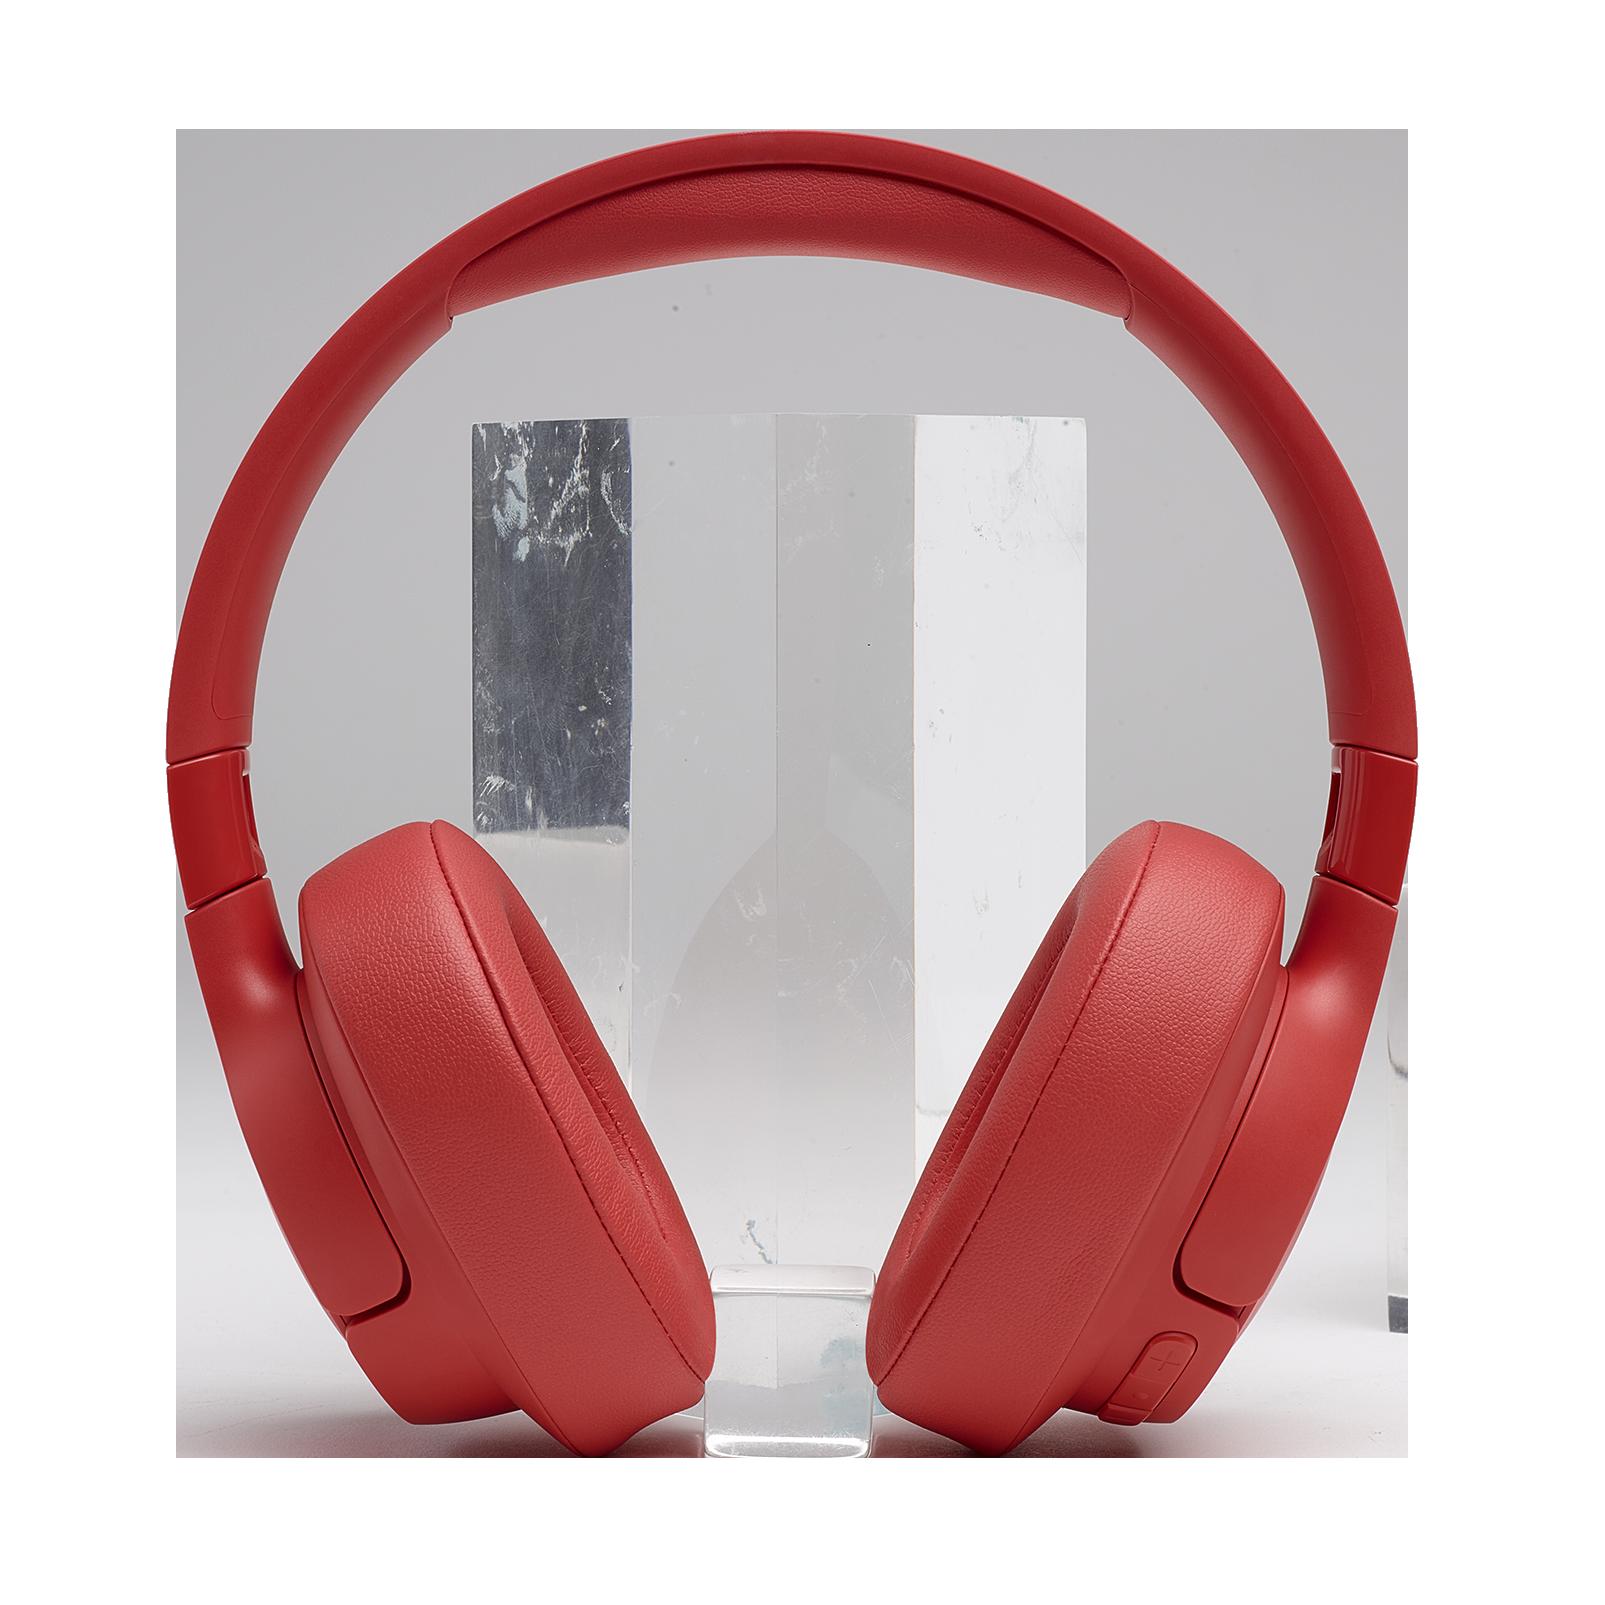 JBL TUNE 700BT - Coral Orange - Wireless Over-Ear Headphones - Detailshot 5